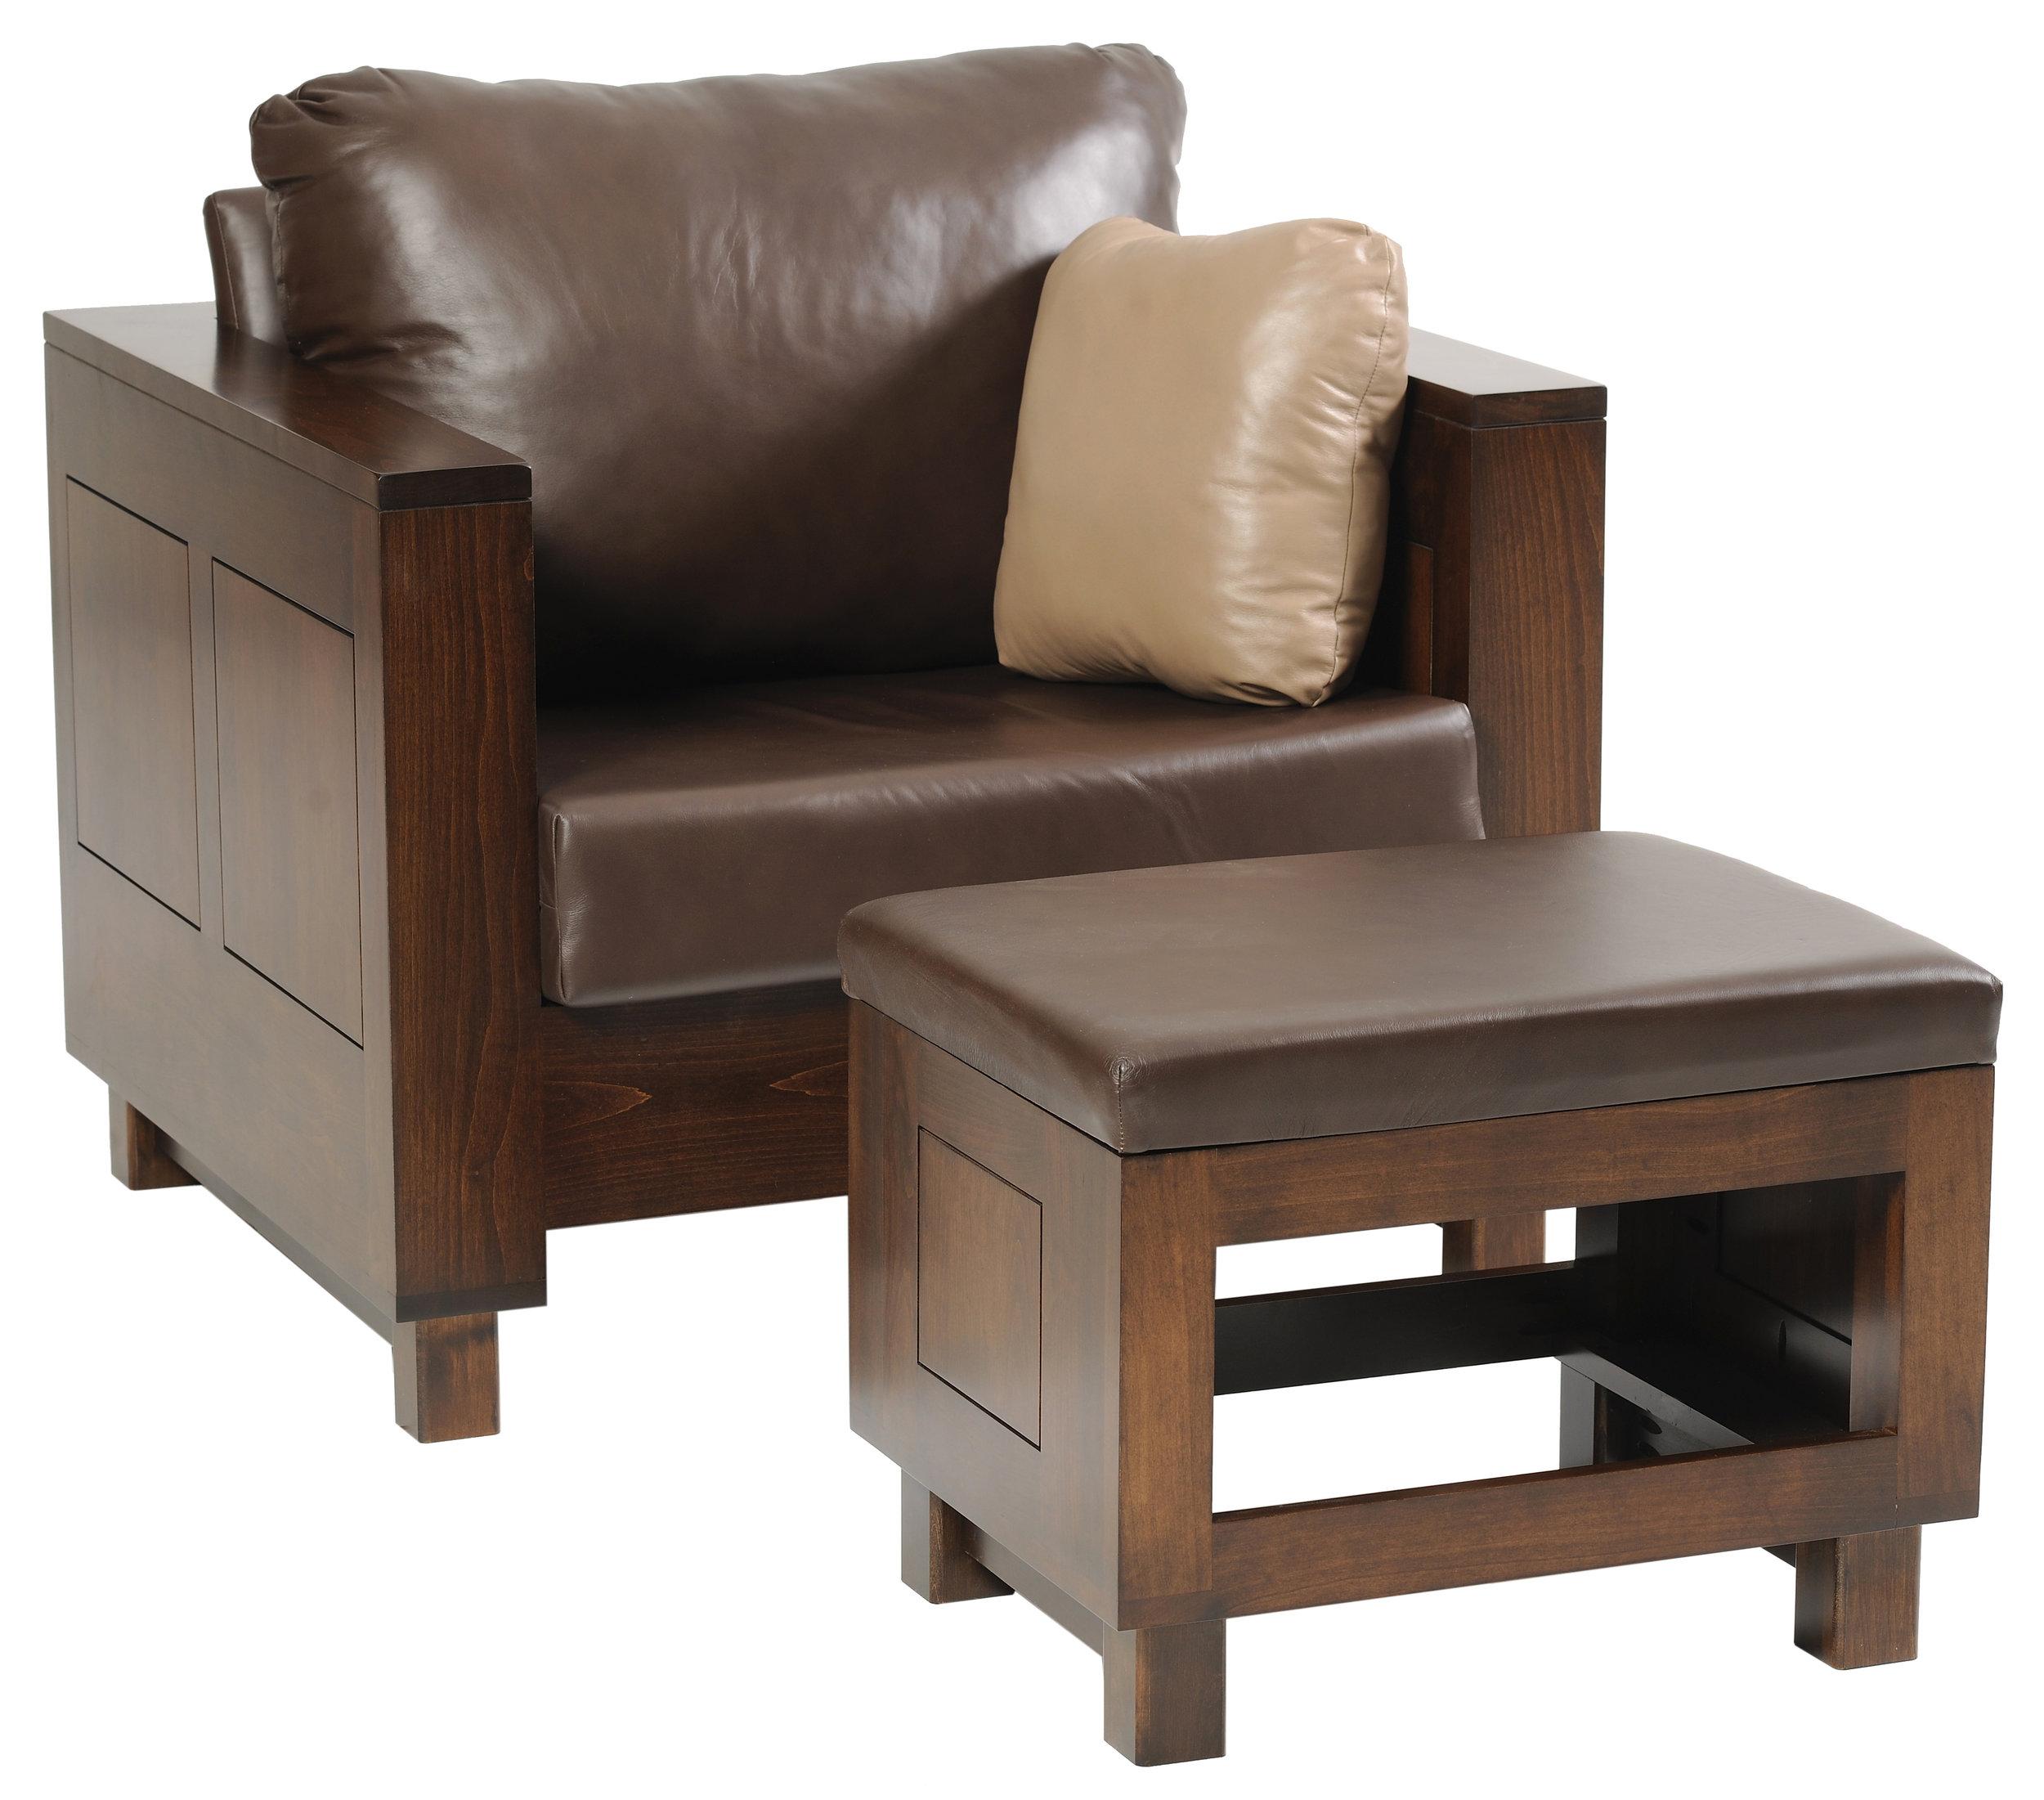 urban chair and ottoman